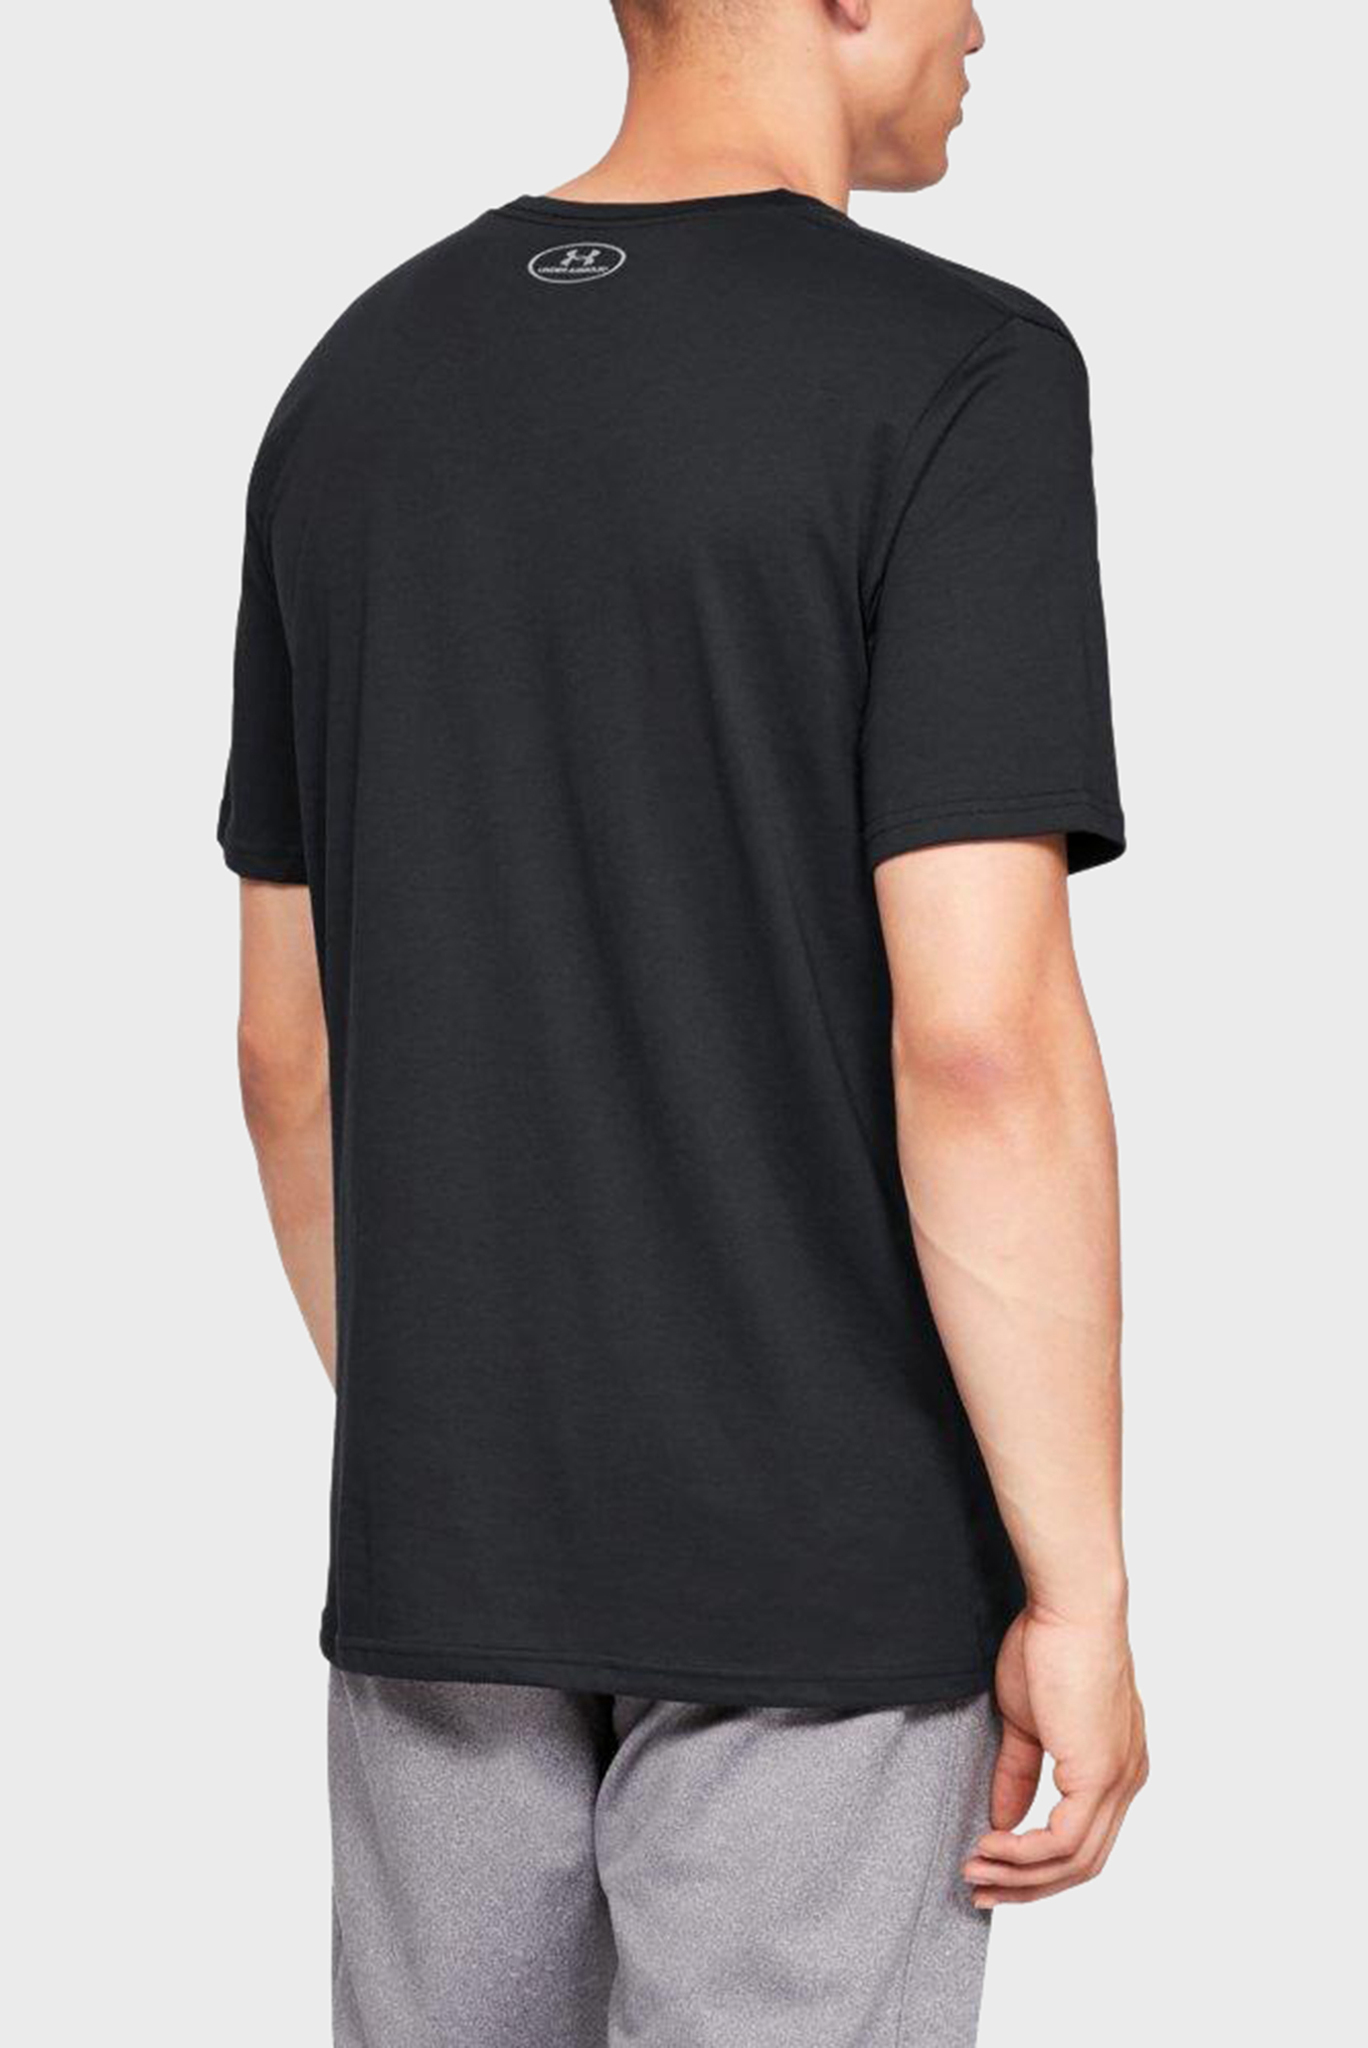 Мужская черная футболка SPORTSTYLE LEFT CHEST SS Under Armour